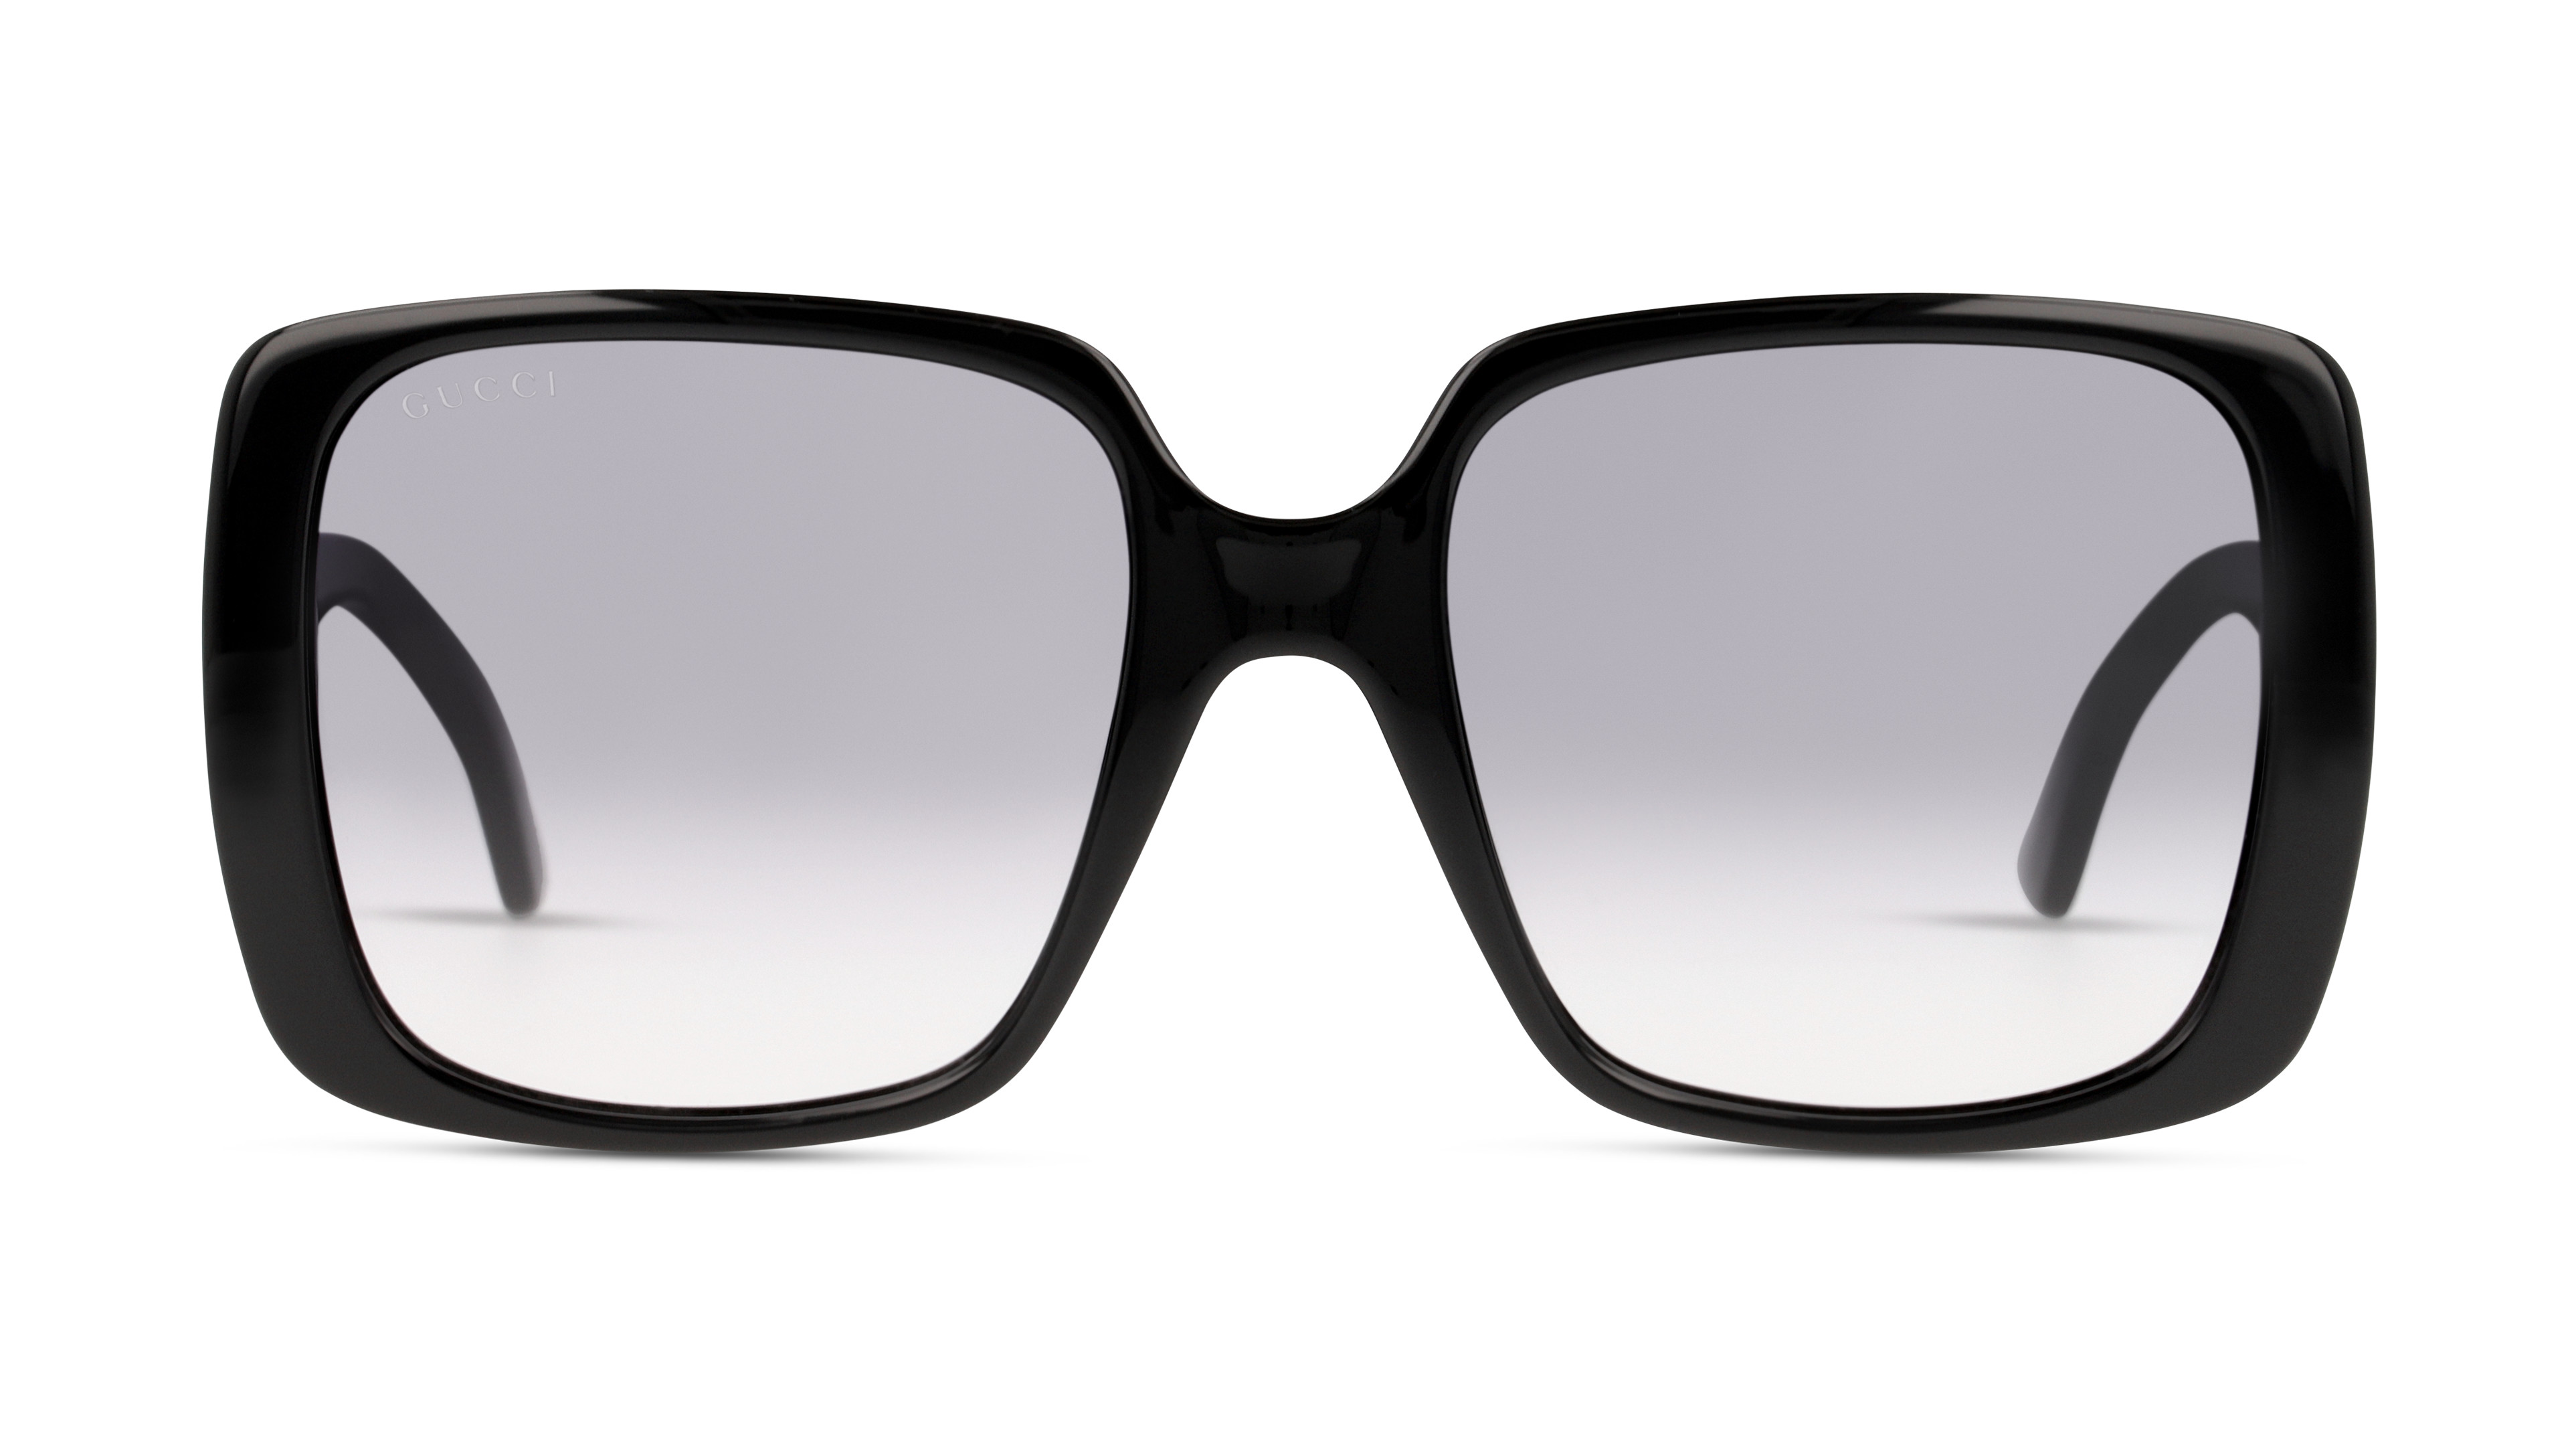 8056376305784-front-01-gucci-gg0632s-eyewear-black-black-grey